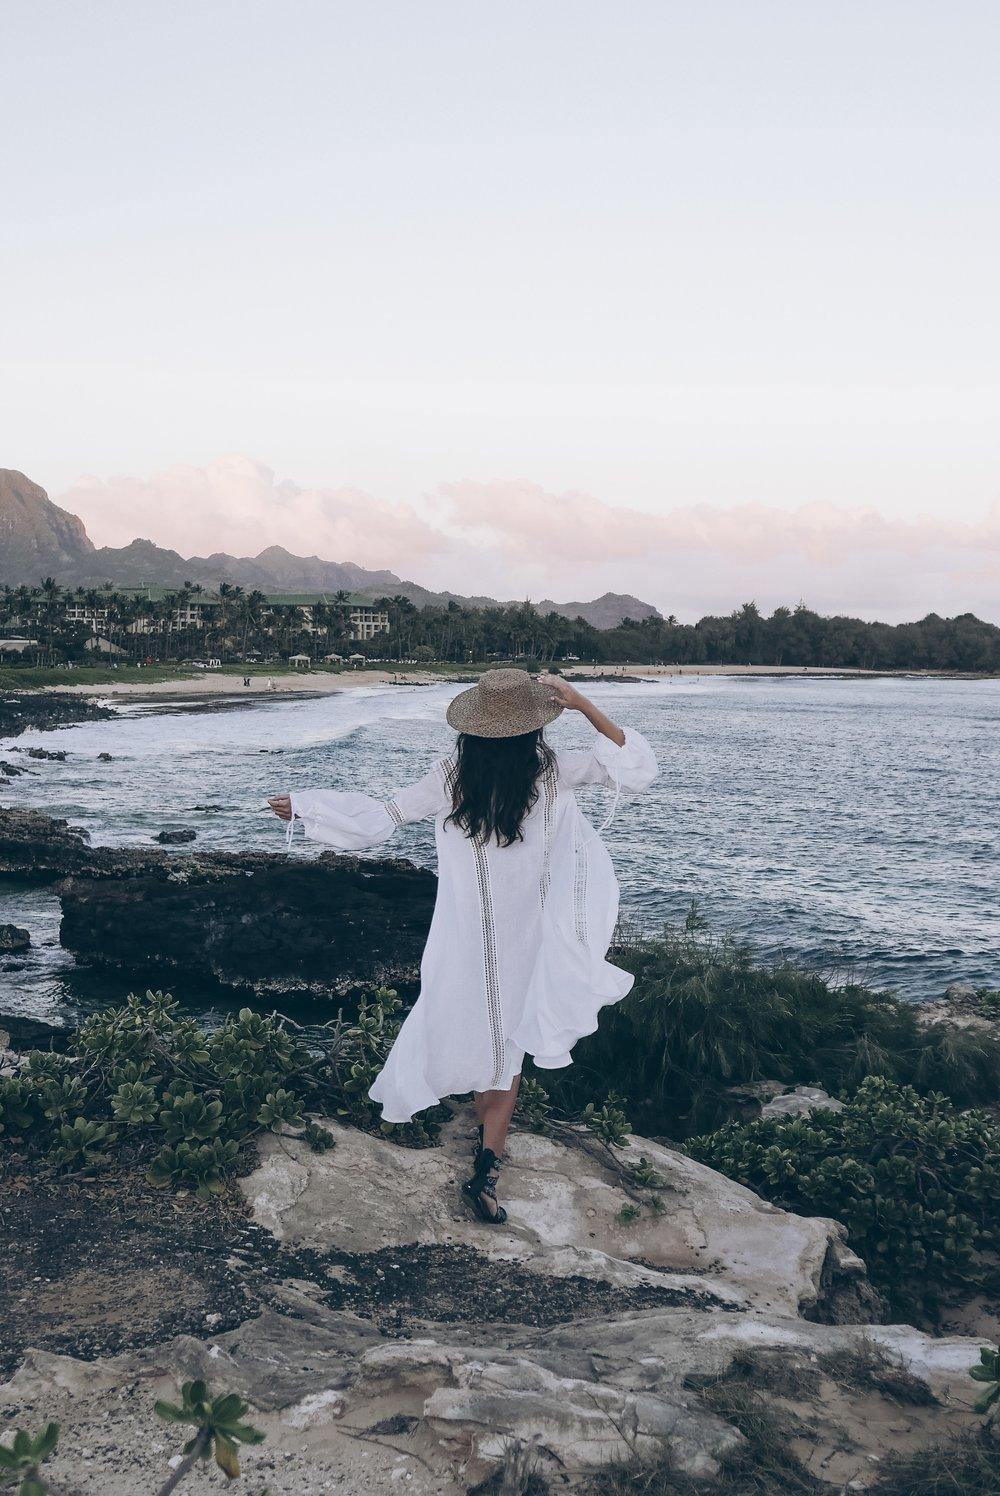 Kauai Travel Guide - Julia Friedman